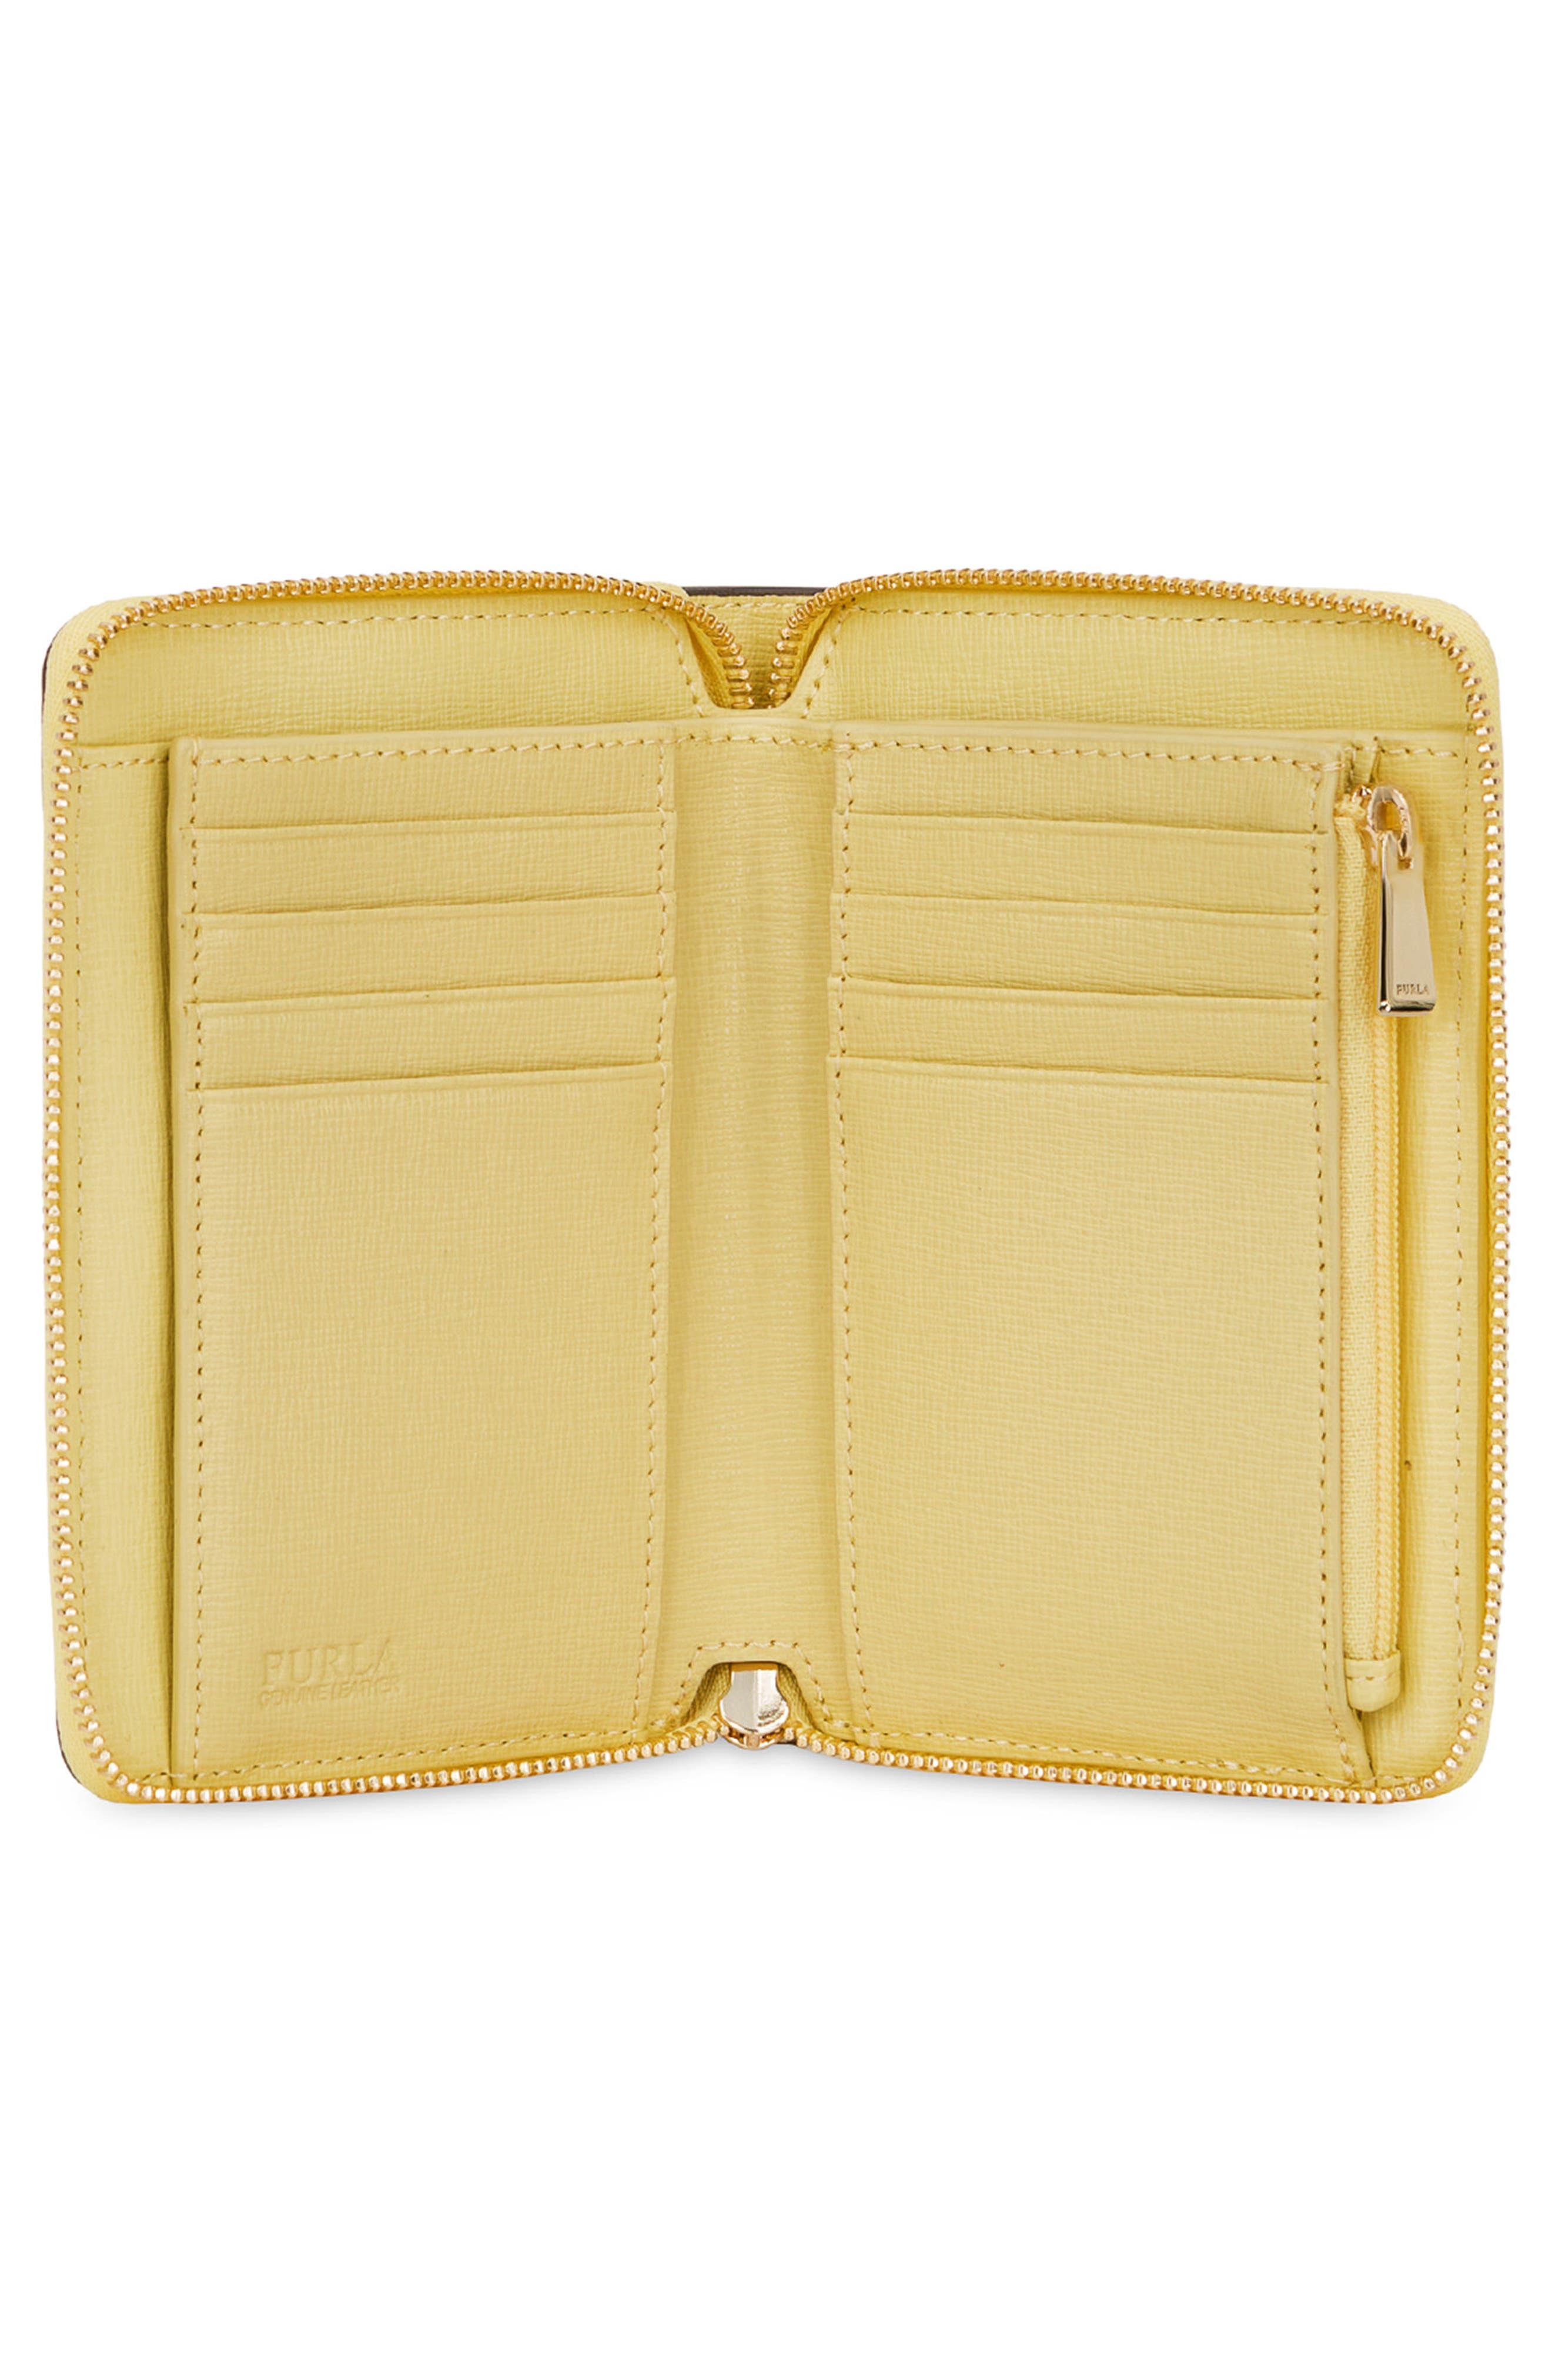 Medium Babylon Saffiano Leather Zip Around Wallet,                             Alternate thumbnail 6, color,